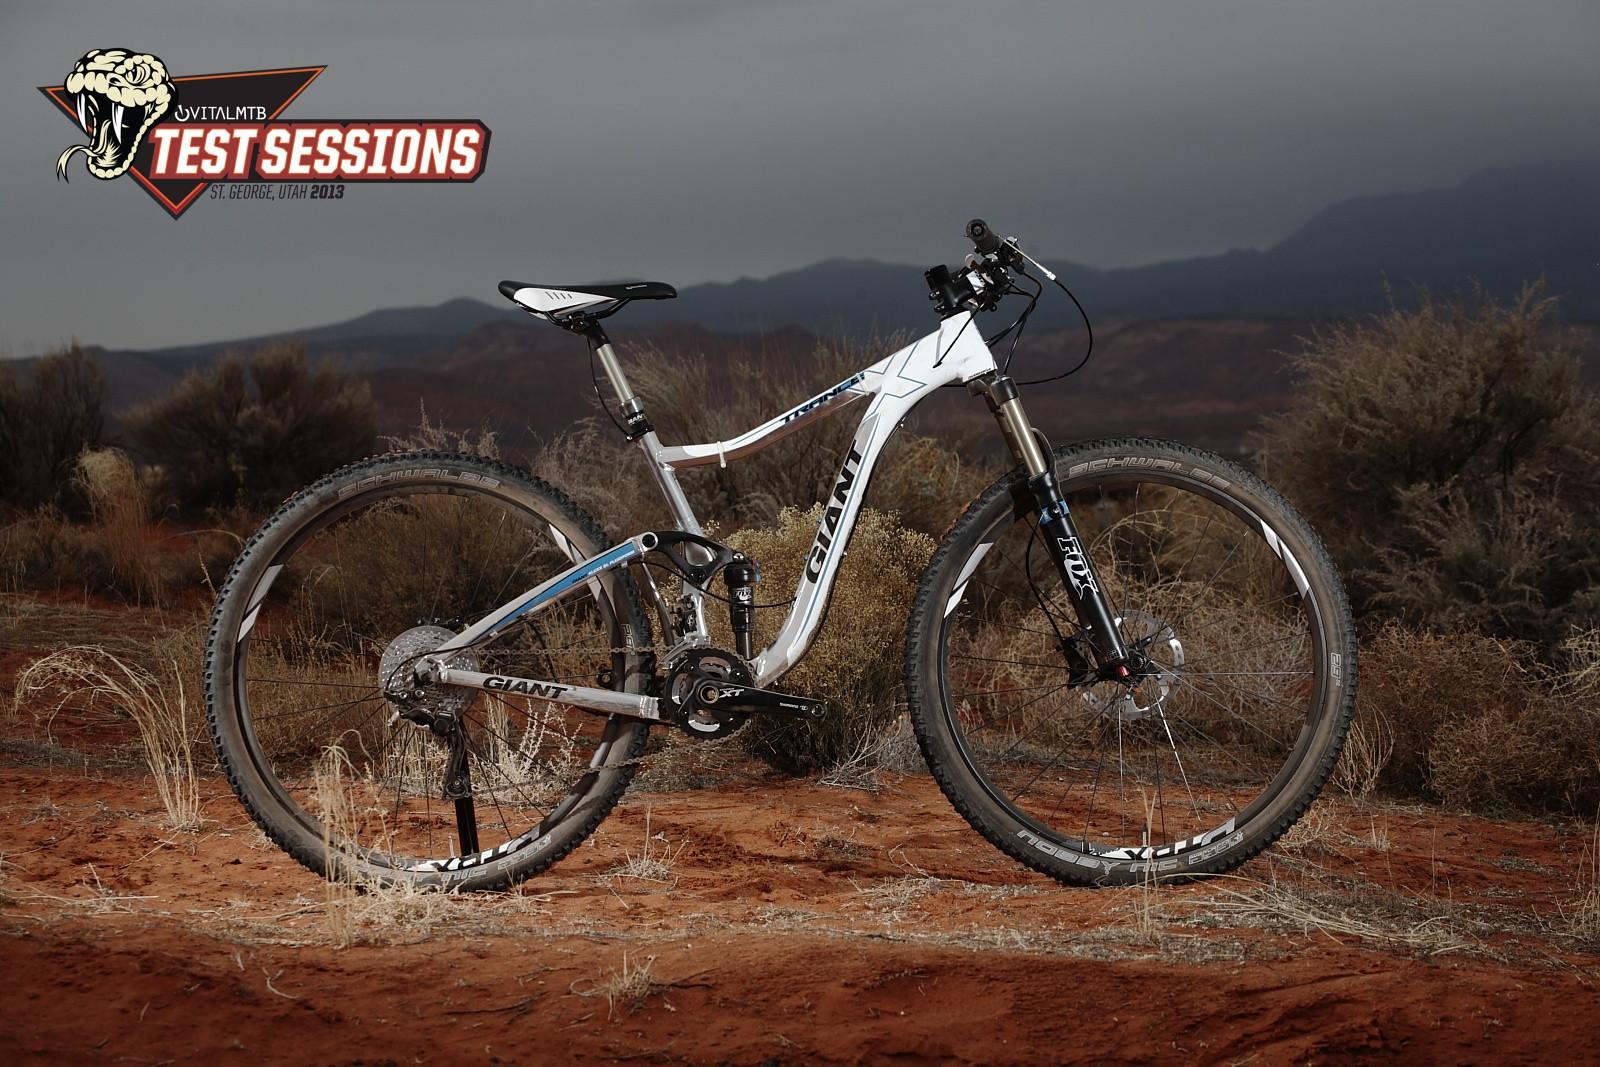 2013 Giant Trance X 29 0 - 2013 Giant Trance X 29 0 - Mountain Biking Pictures - Vital MTB